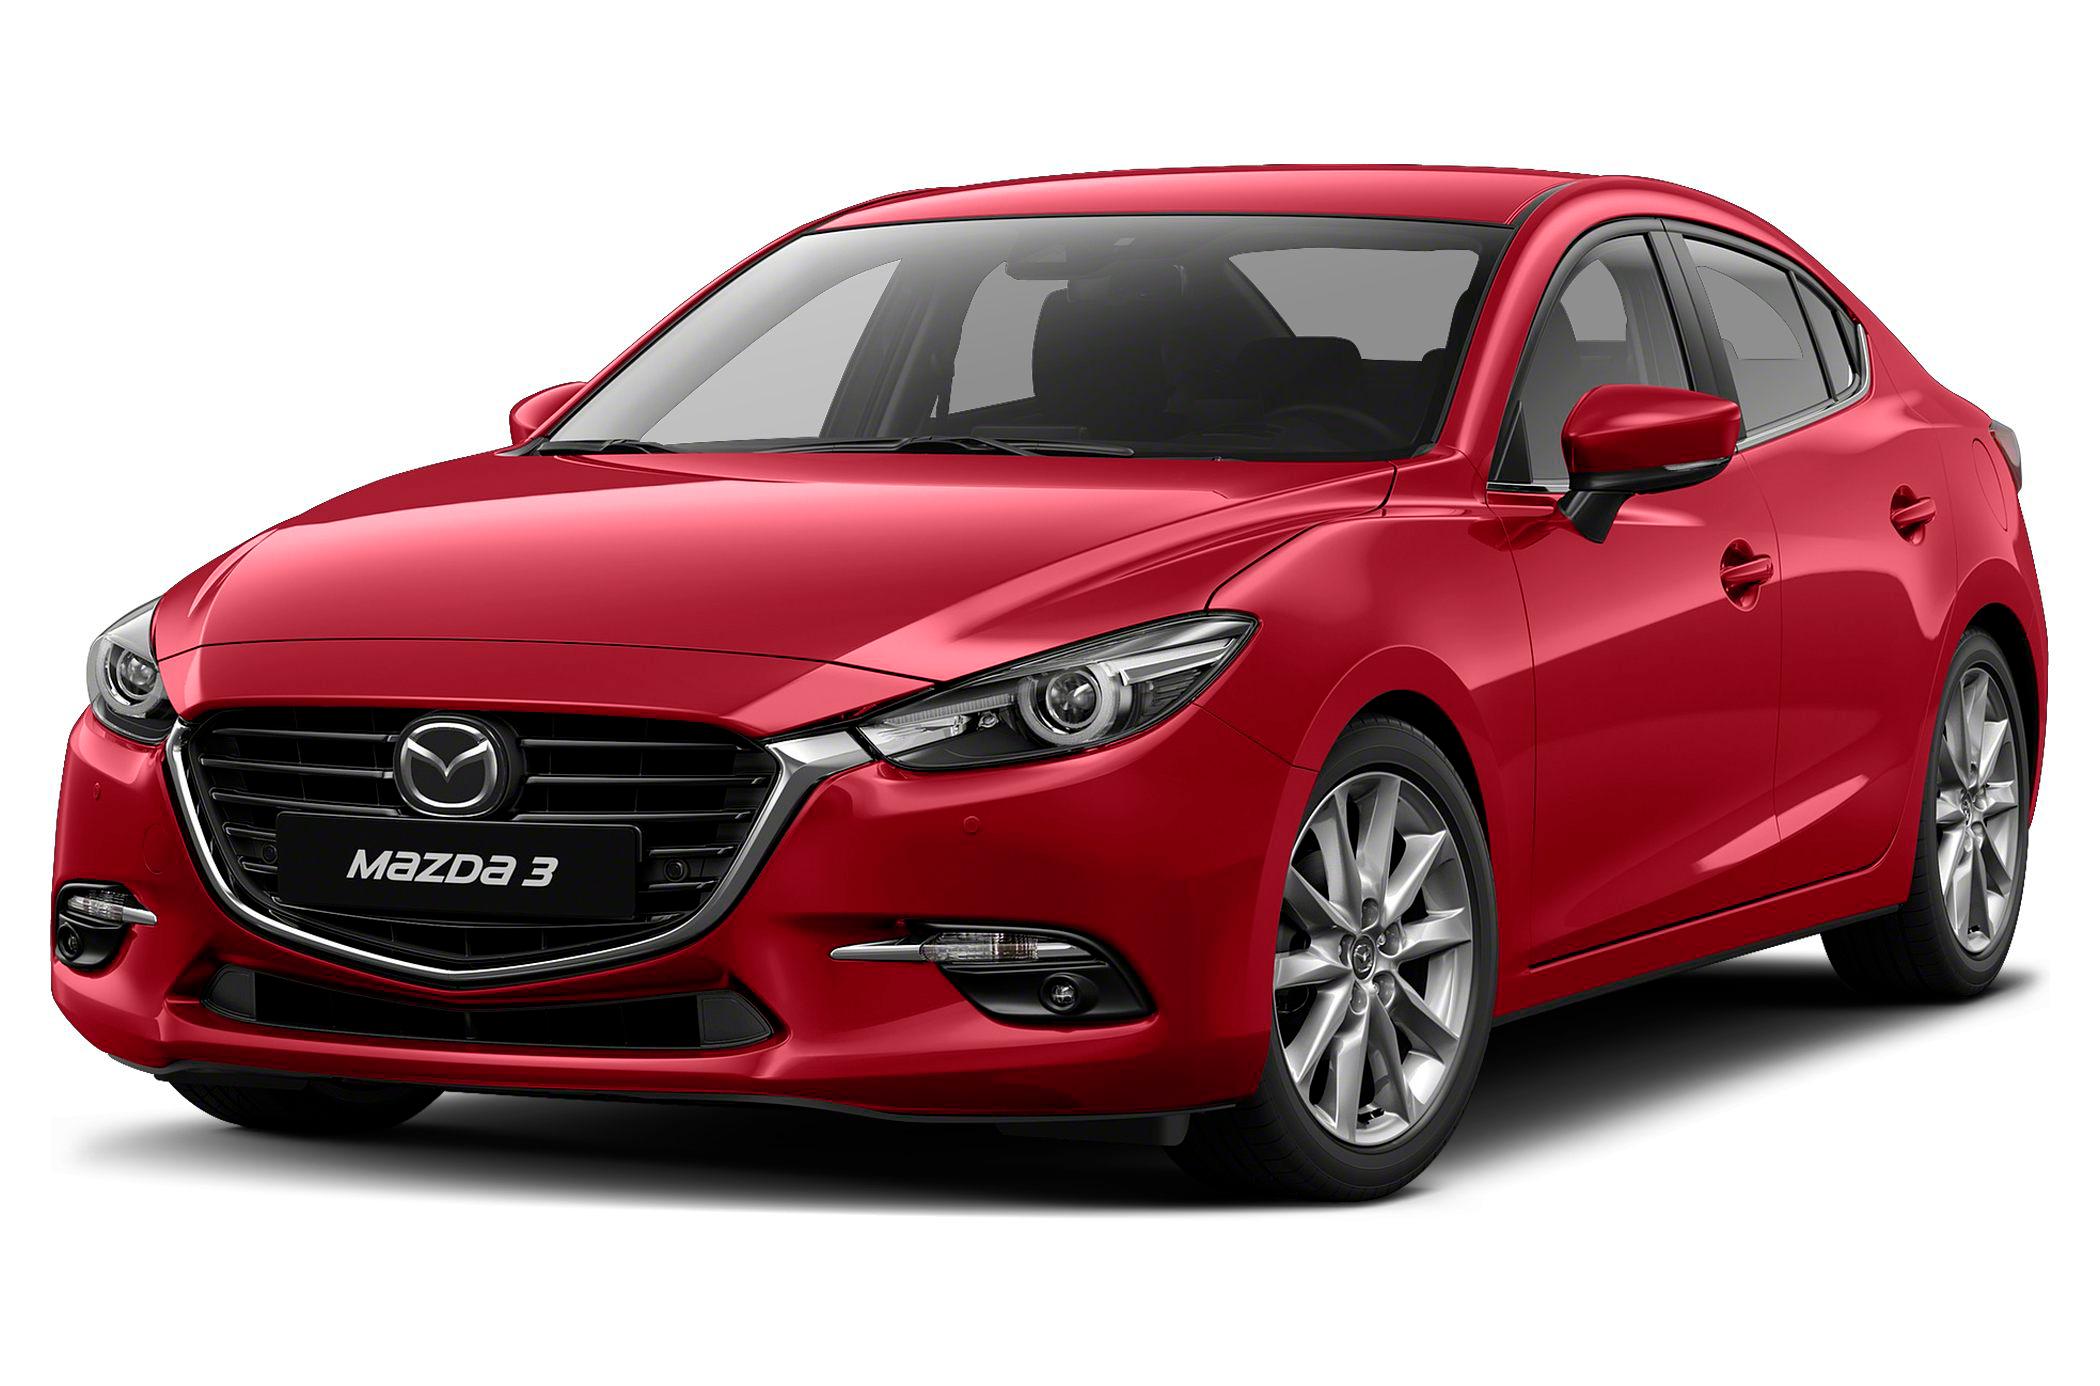 Mazda 3 Lug Pattern Interesting Inspiration Design